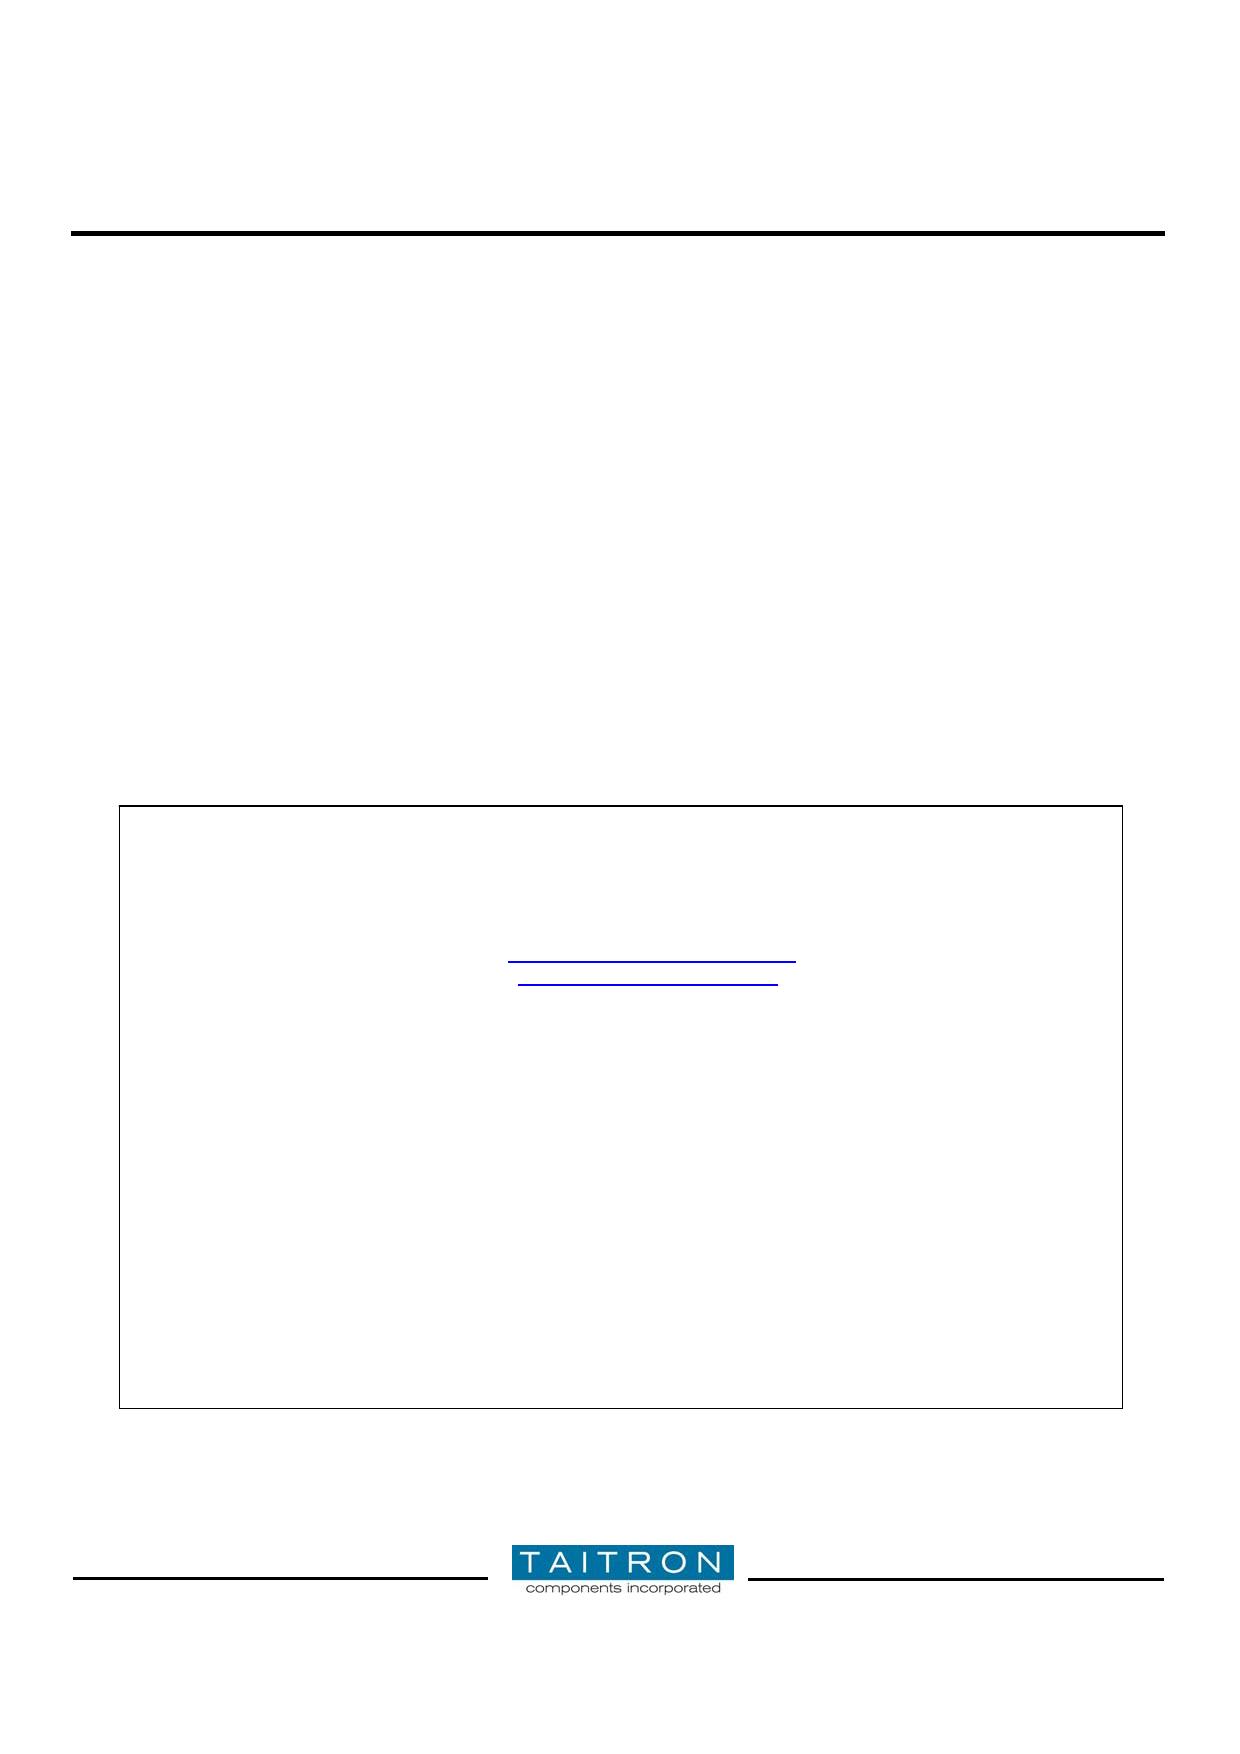 MR850 pdf, 반도체, 판매, 대치품